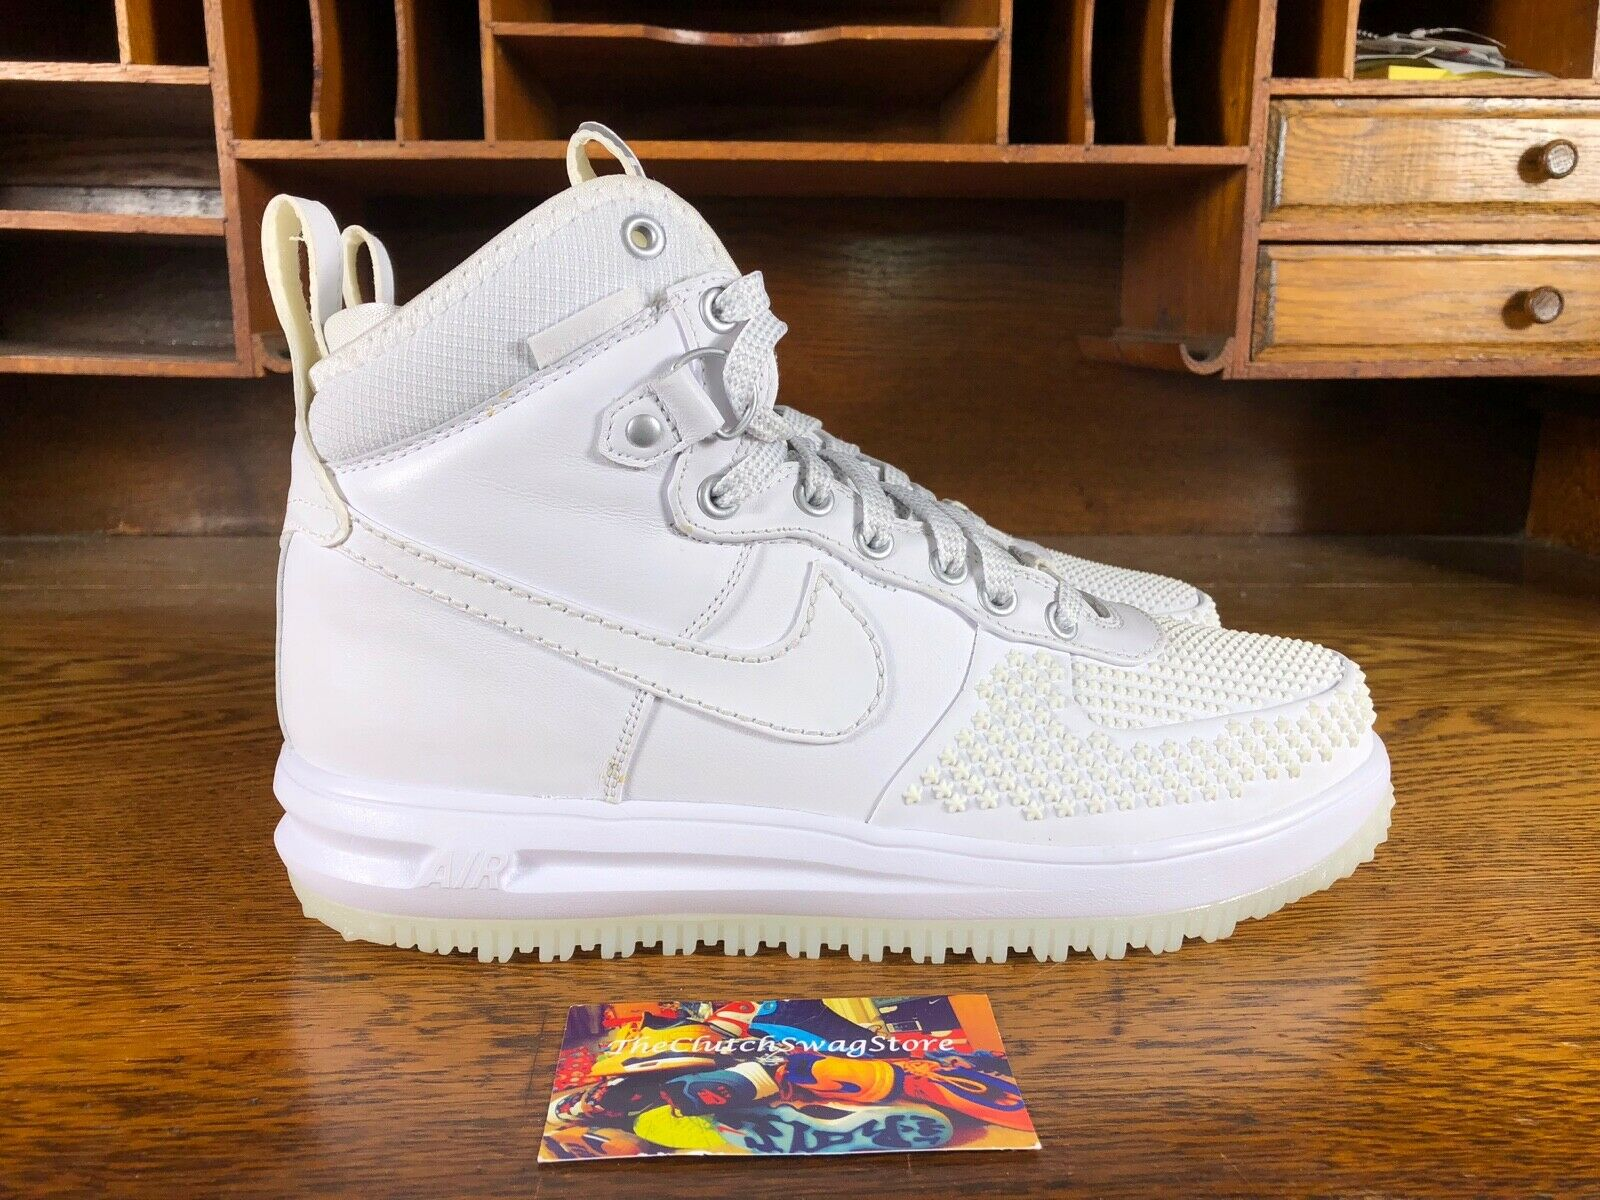 Nike Lunar Force 1 Duckboot Mens High Top Triple White Off White 805899-101 Sz 8